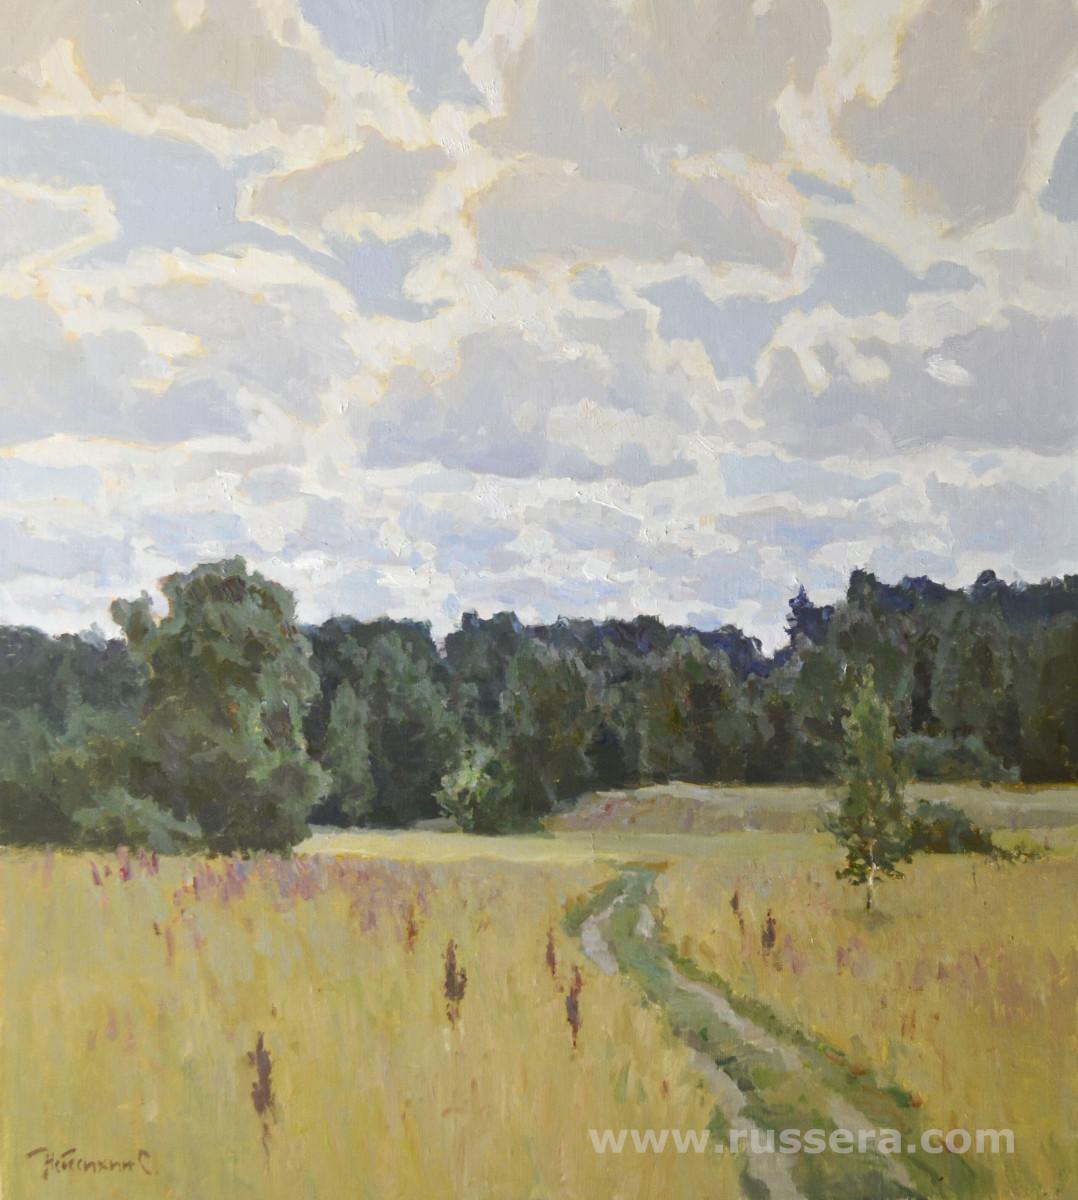 In the Grove by Sergey Nebesihin